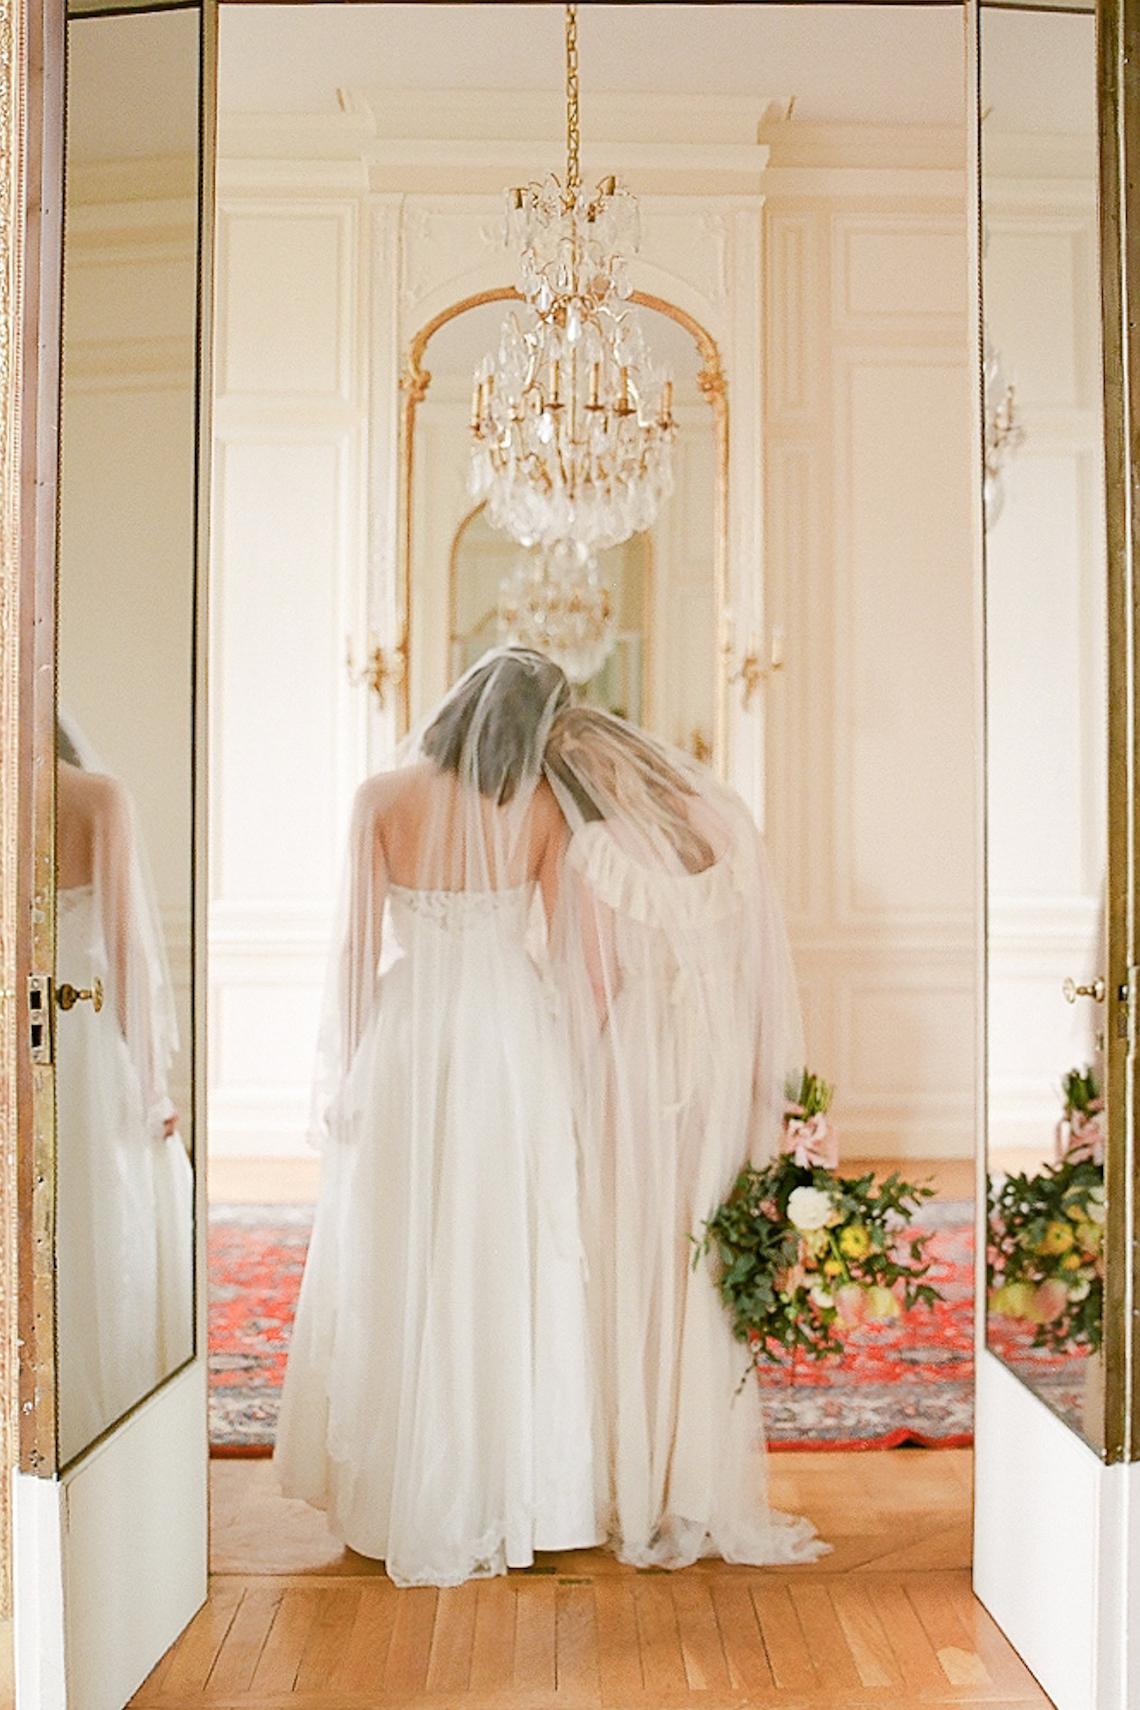 Elegant Blush Parisian Bridal Inspiration Featuring Luxurious Veils and Boudoir Ideas – Bonphotoge 32